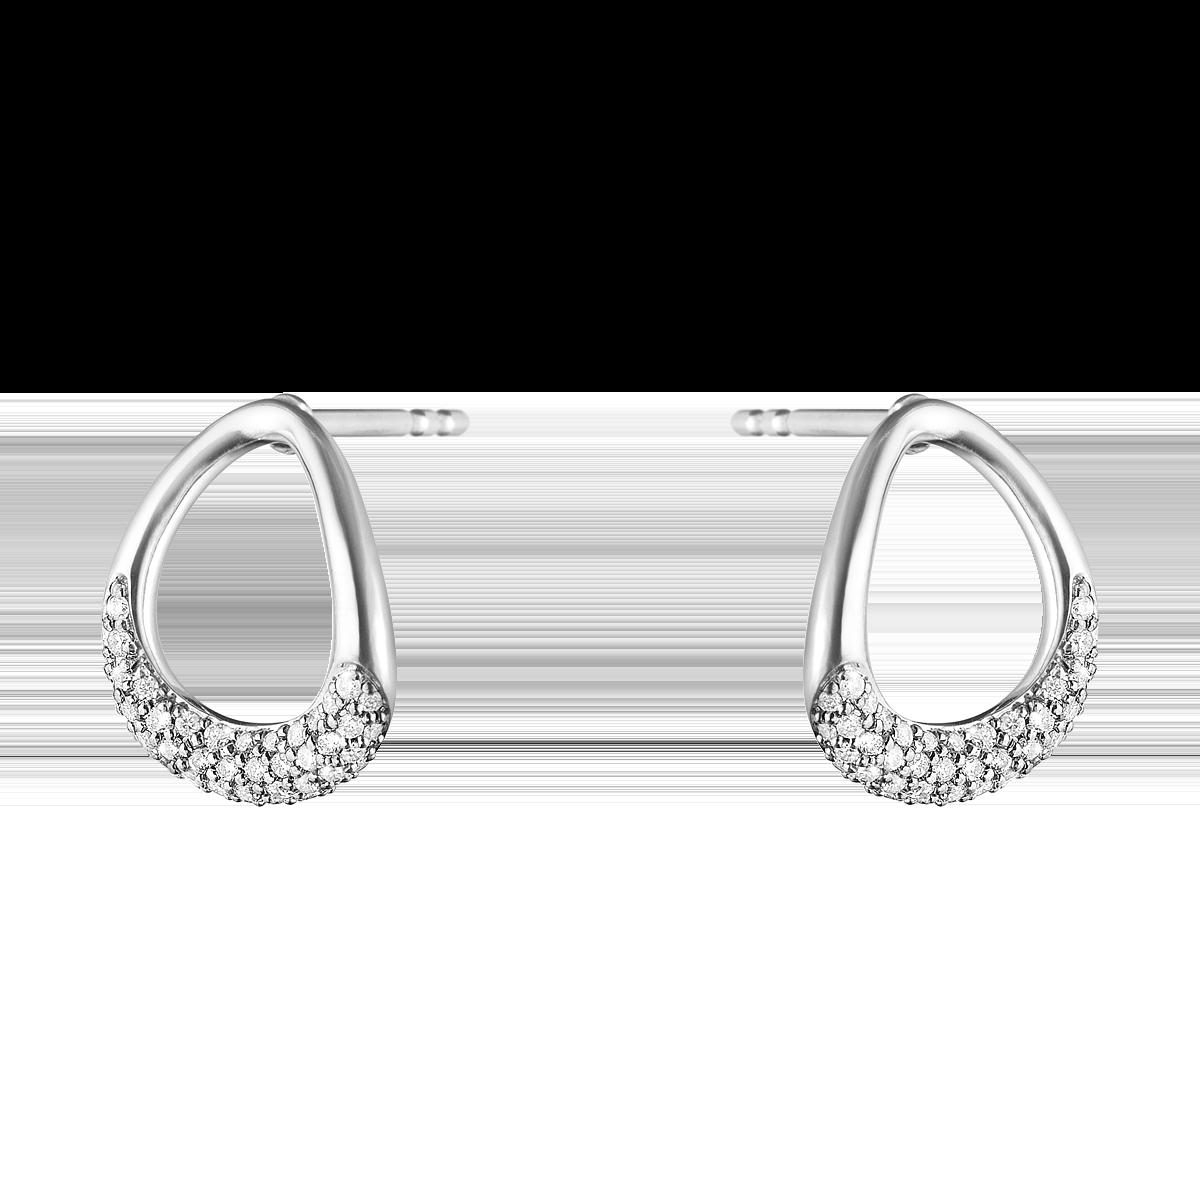 10015849-OFFSPRING-earstud-silver